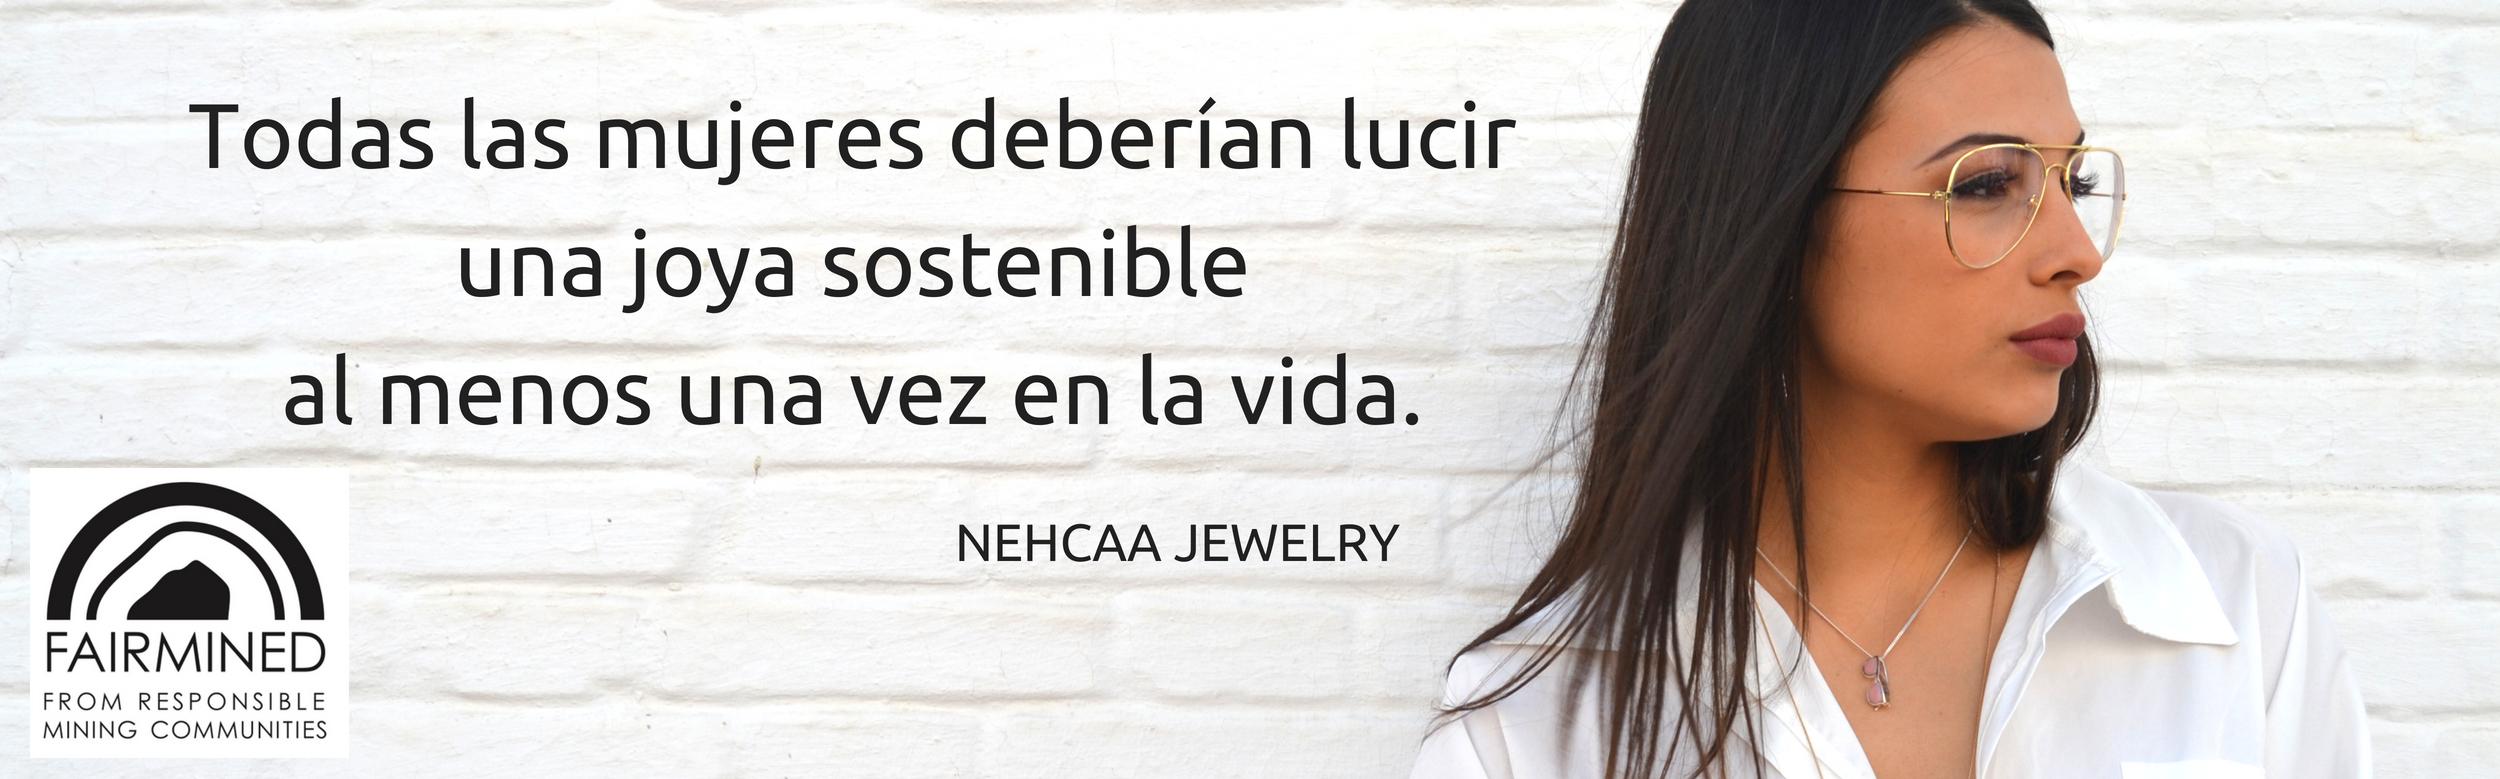 Joyeria sostenible-tienda online NEHCAA